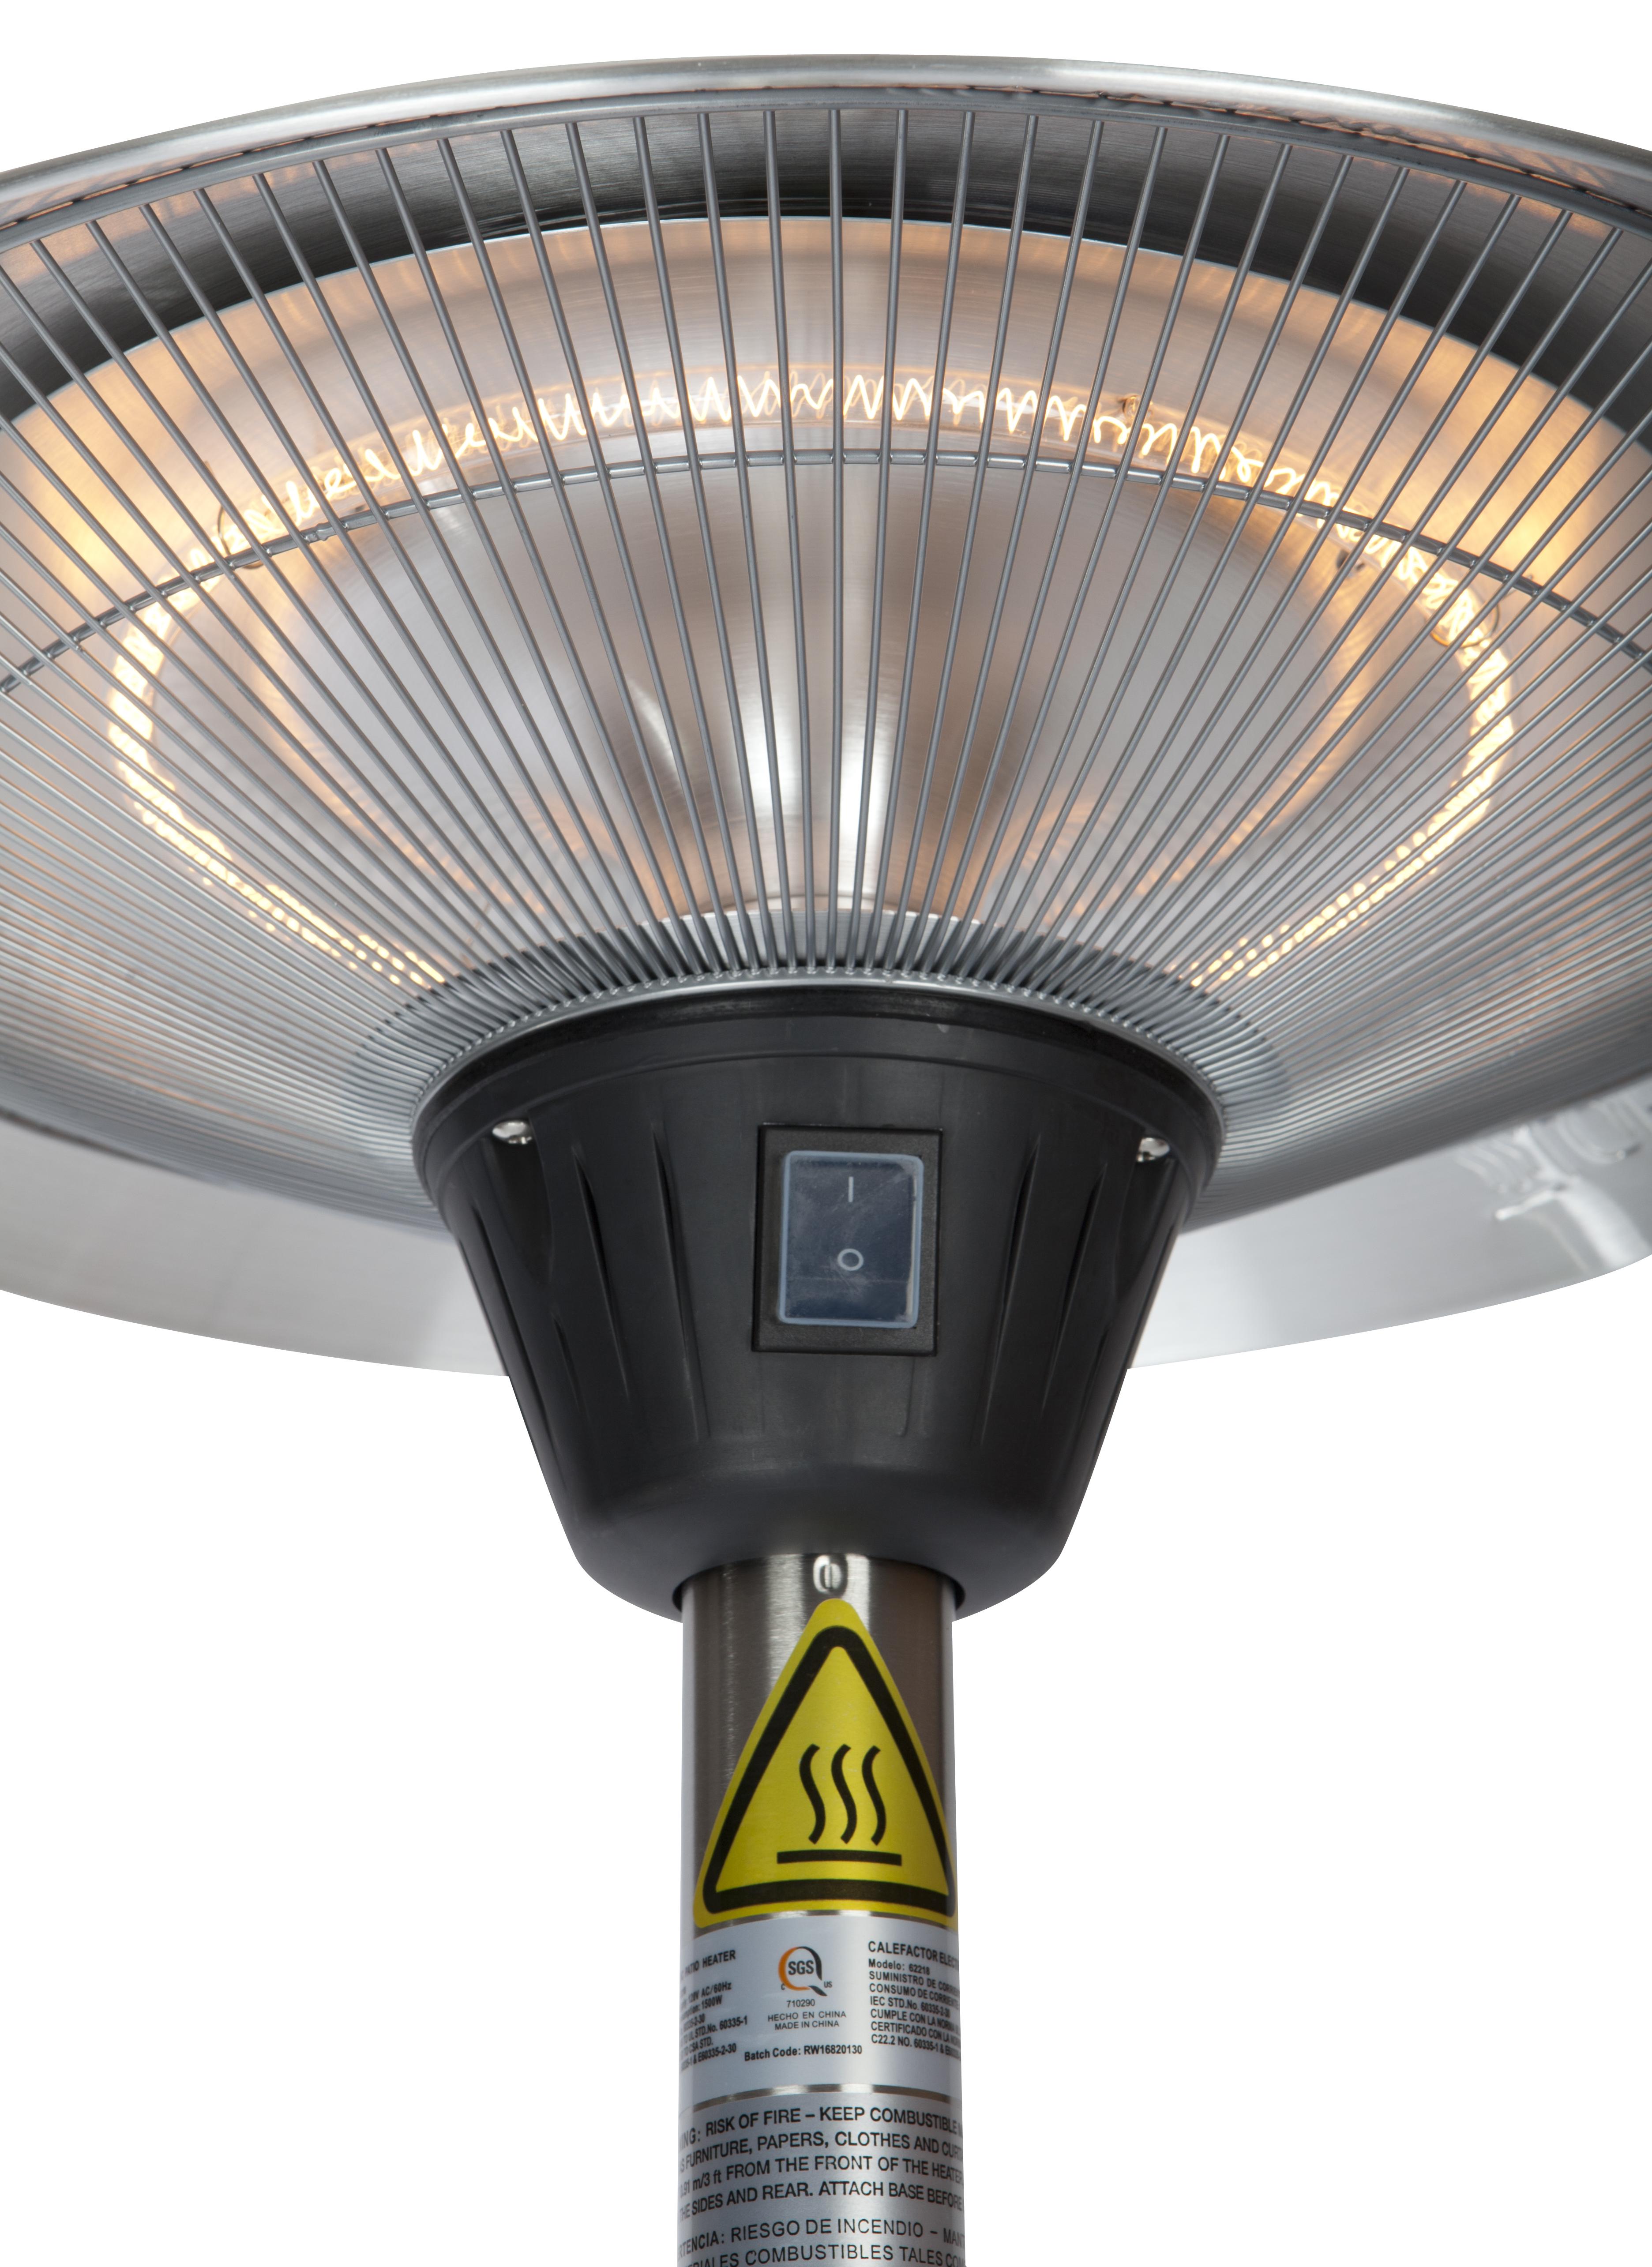 Frisco Stainless Steel Halogen Patio Heater Well